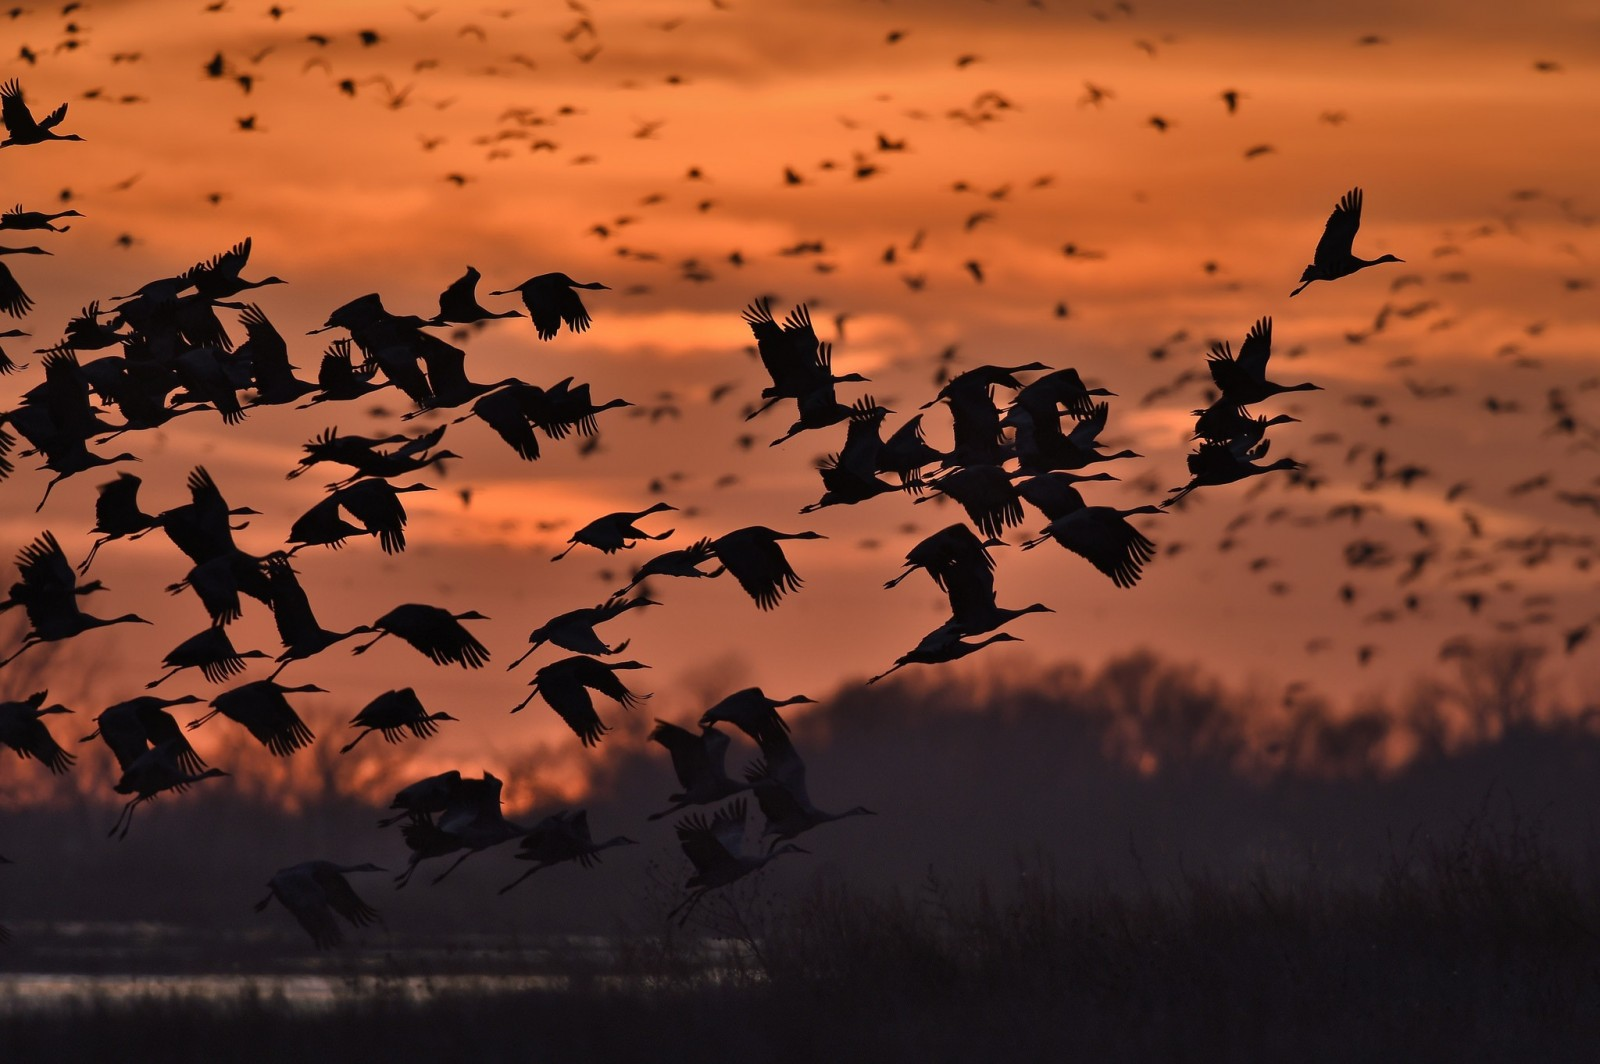 animals_nature_birds-135420